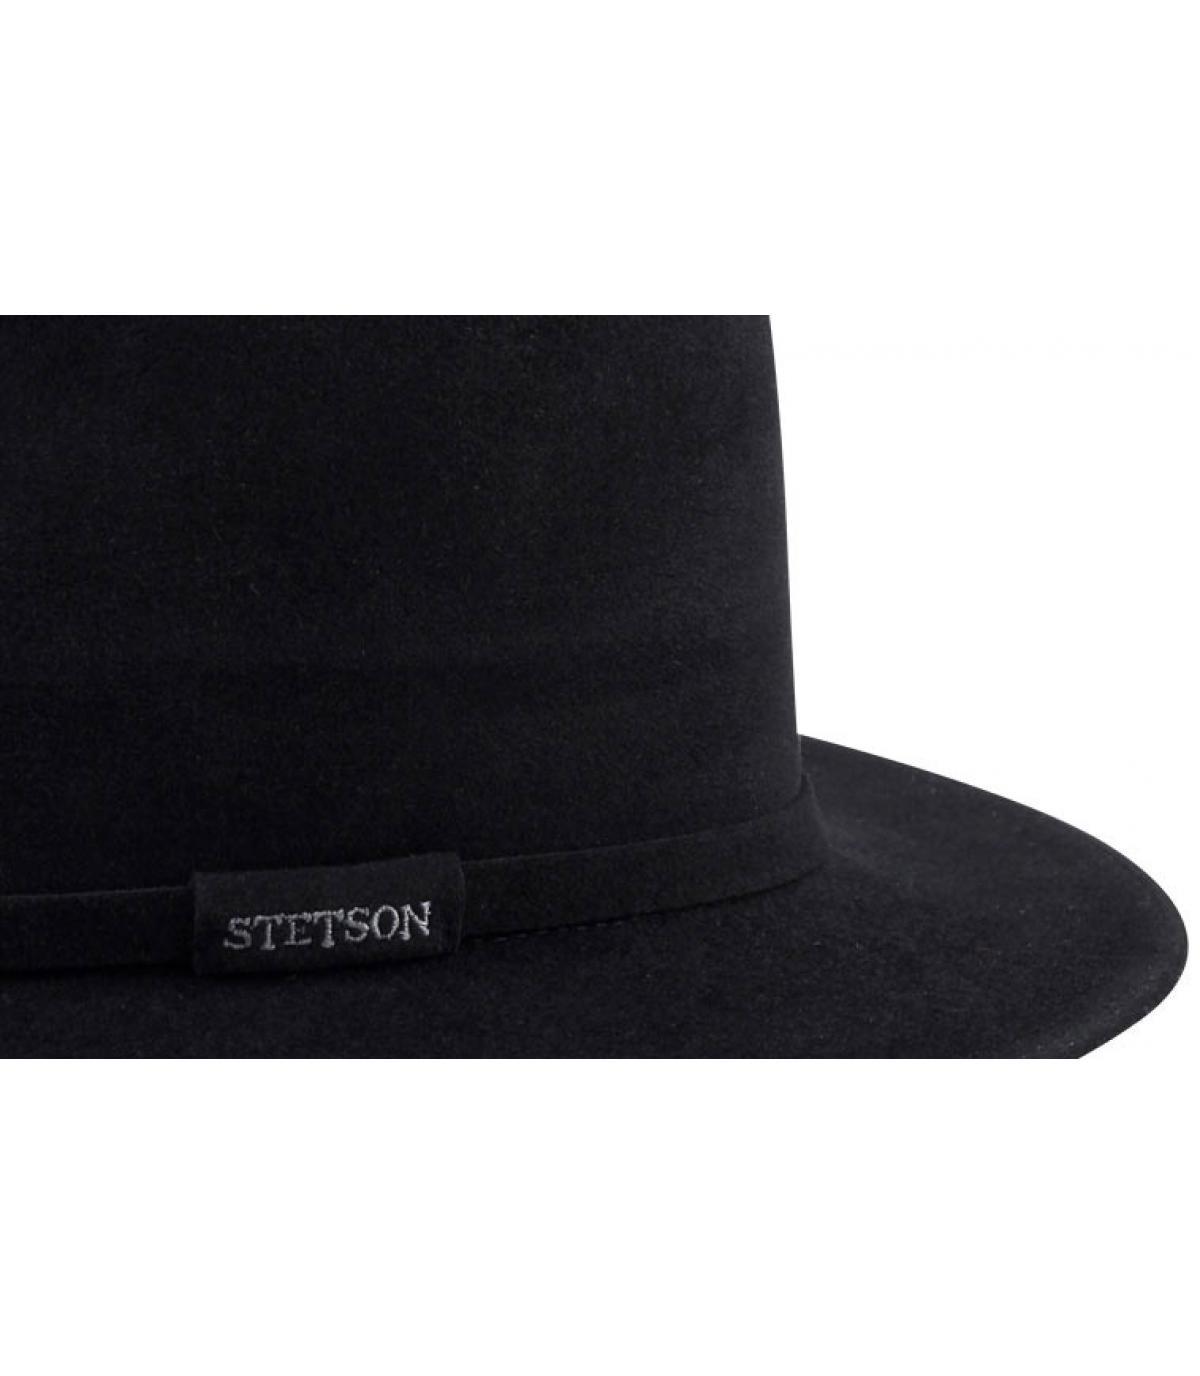 Sombrero borsalino stetson. Detalles Michael negro imagen 5  Detalles  Michael negro imagen 1 ... a41760a438f